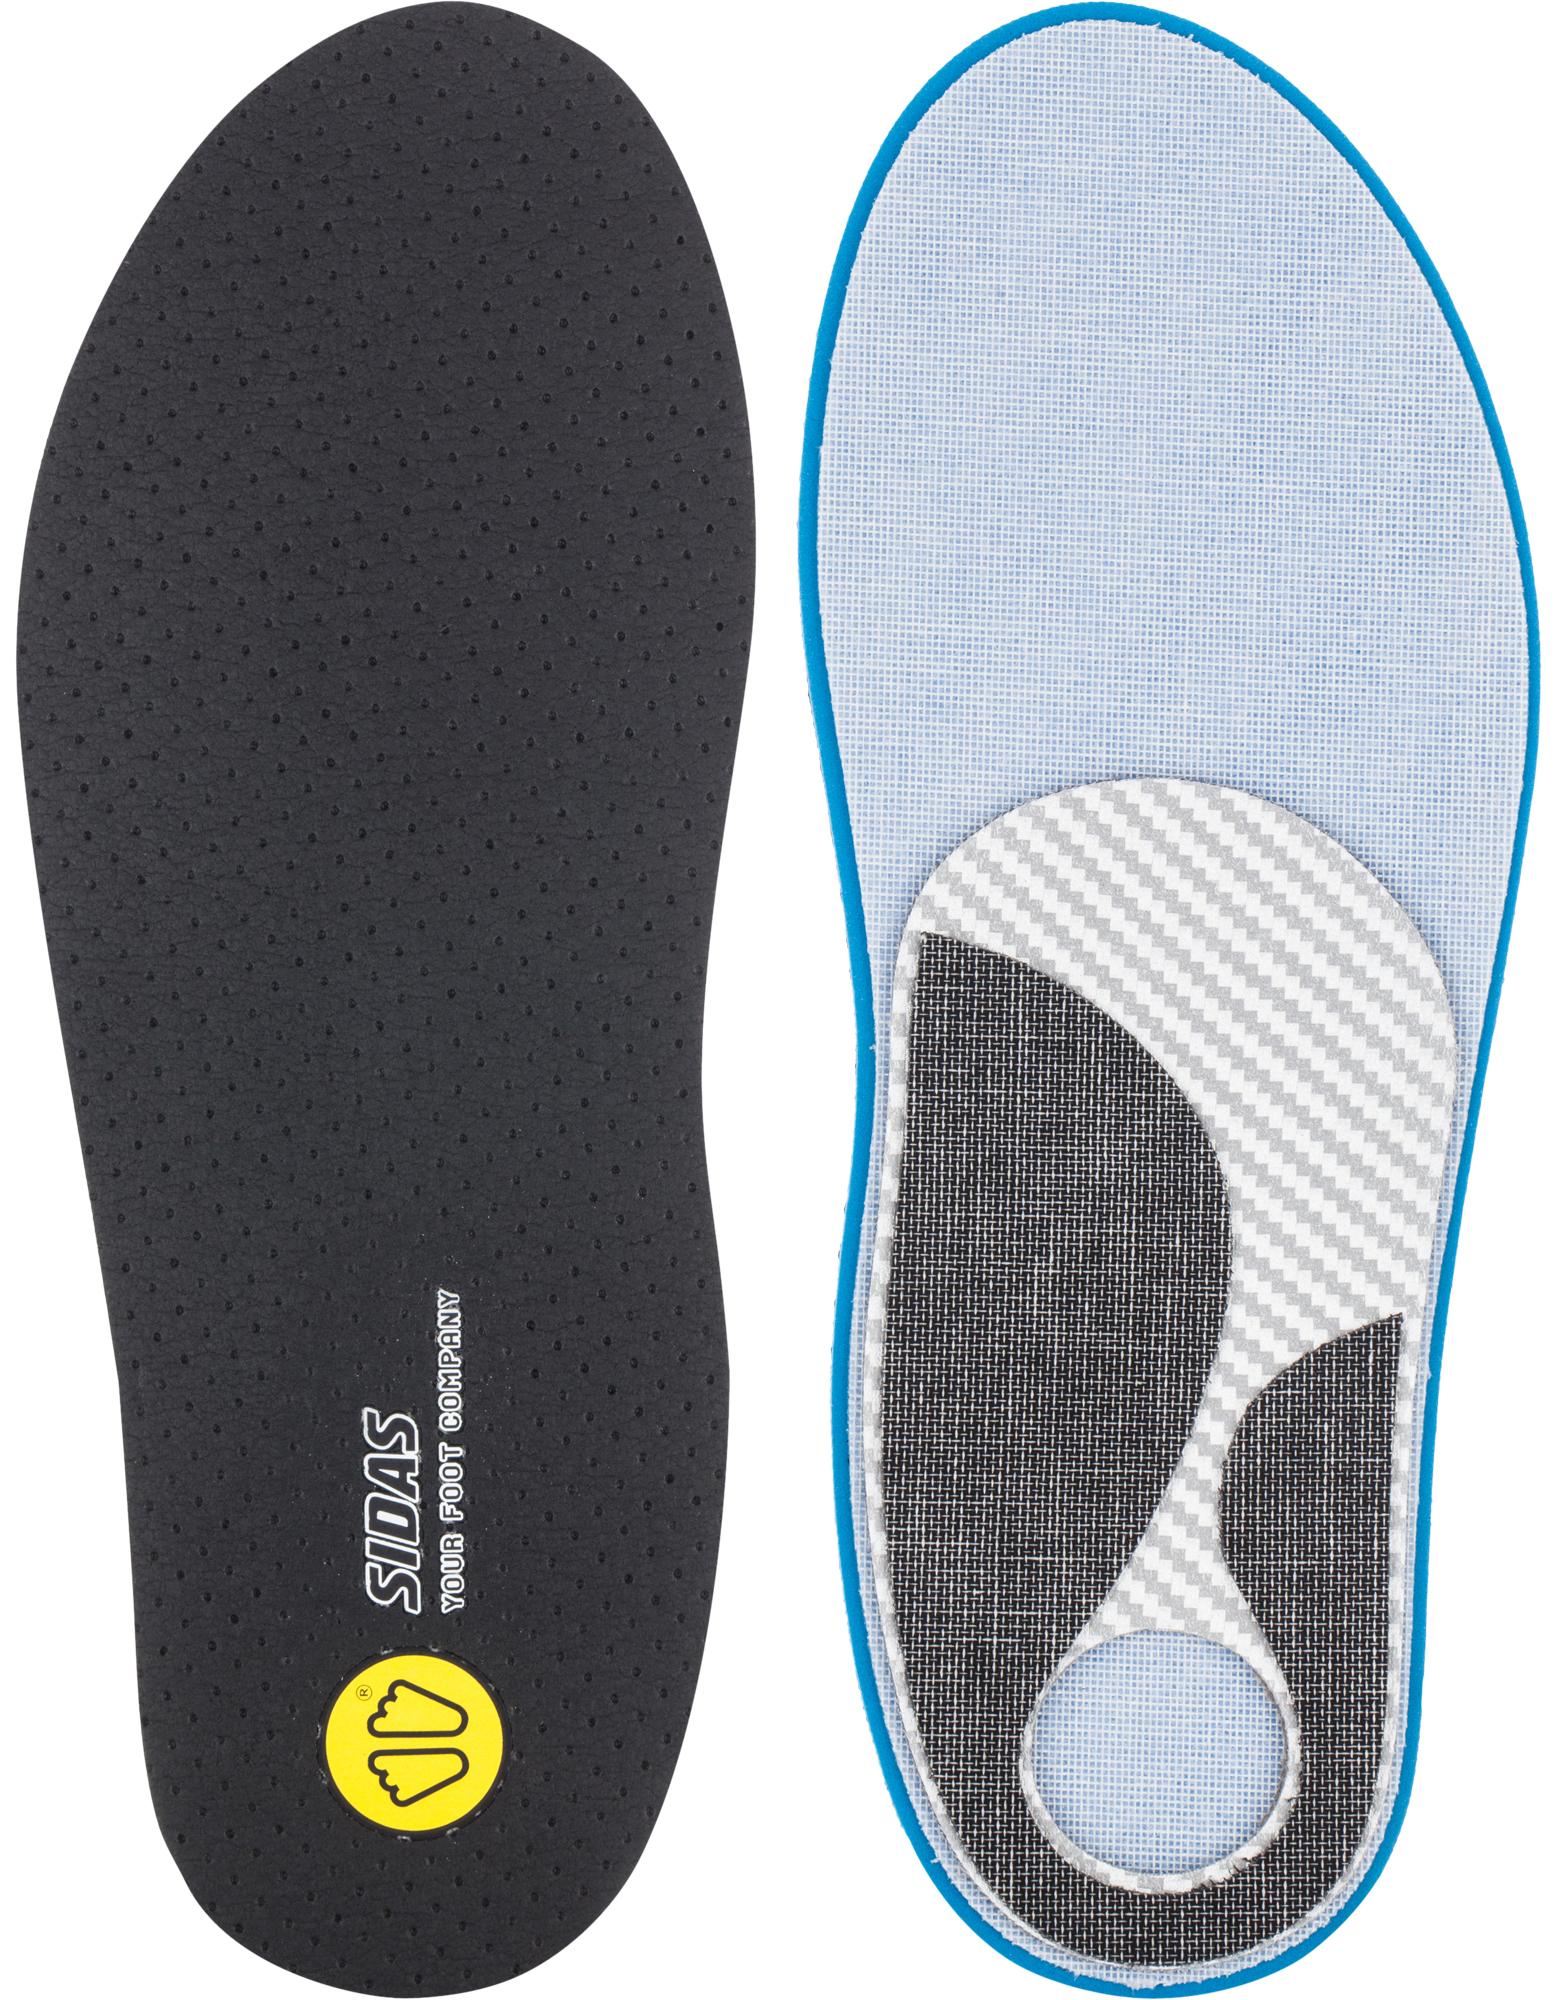 Sidas Стельки Sidas Insoles стельки формируемые sidas custom ski prem xl